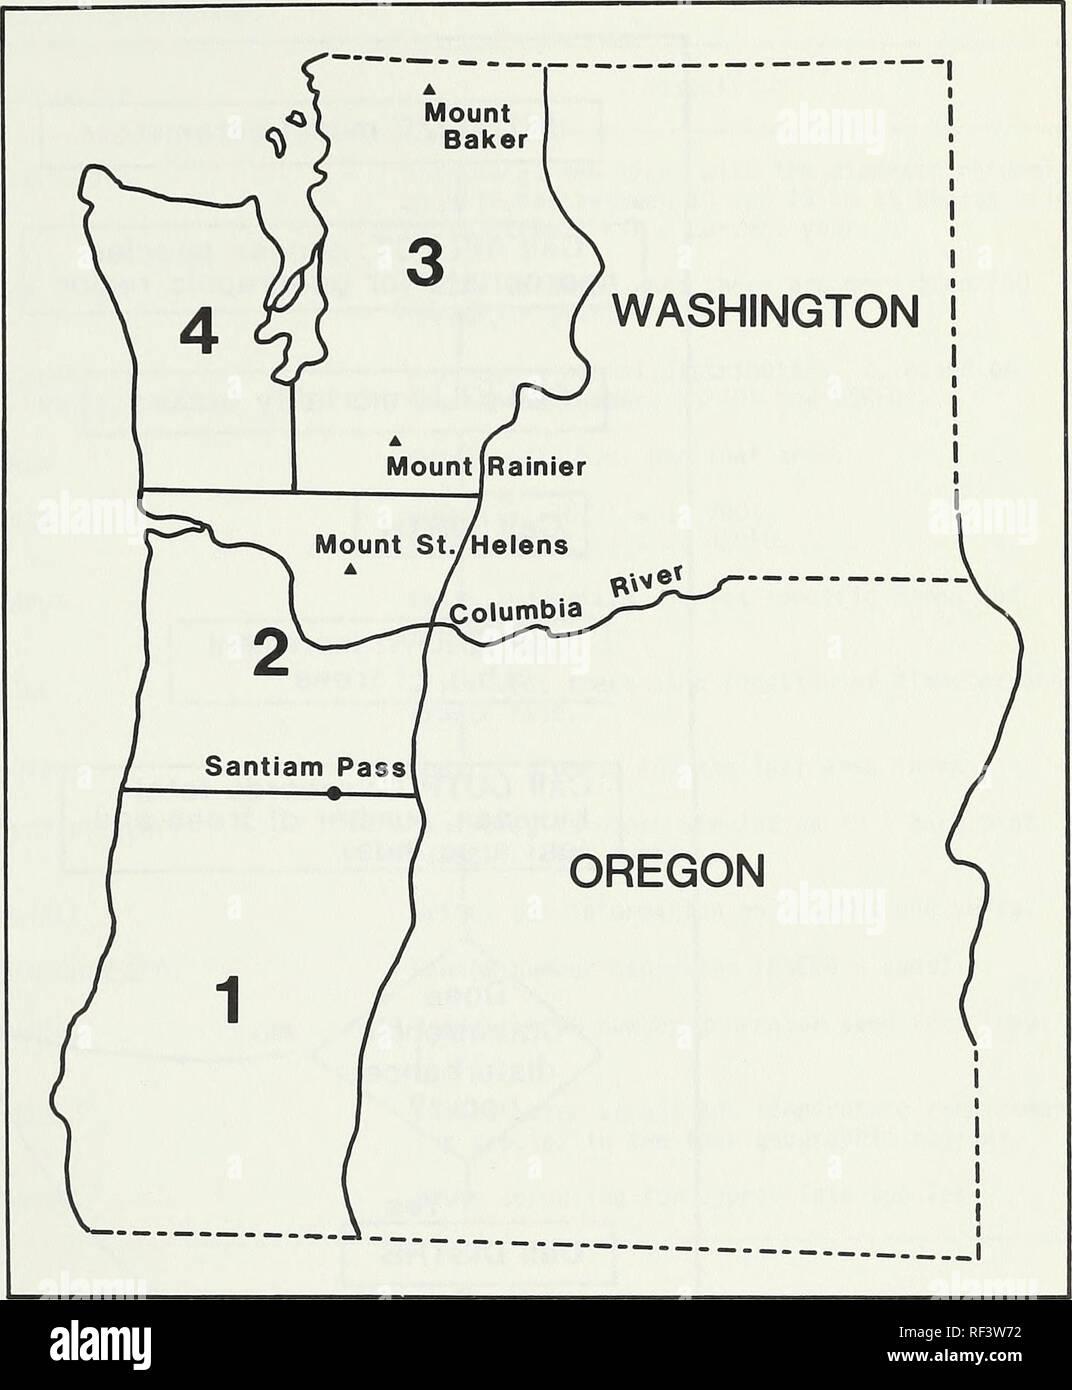 datazione radiometrica Mount St Helens incontri al liceo Yahoo Answers